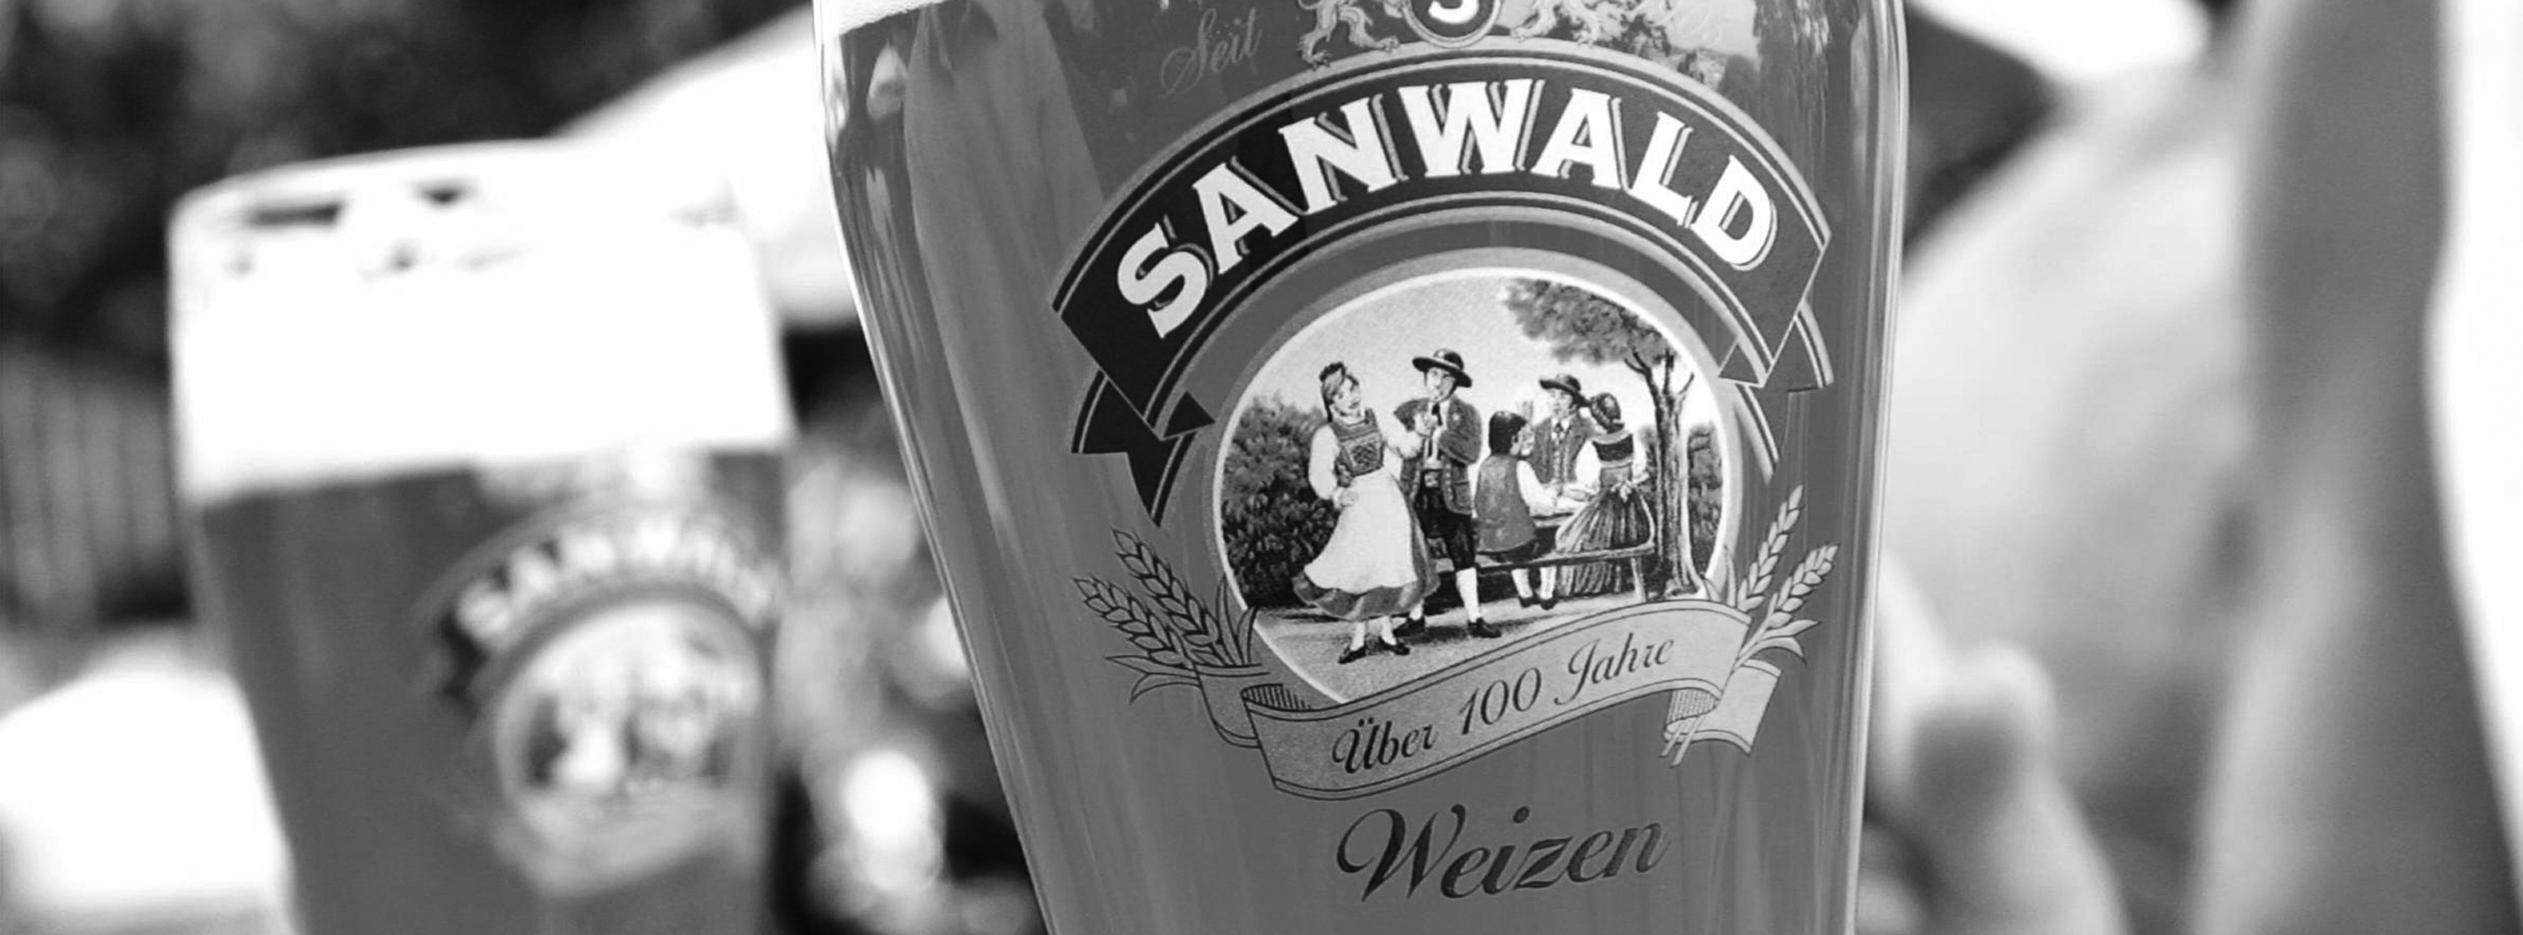 Sanwald Weizenbier